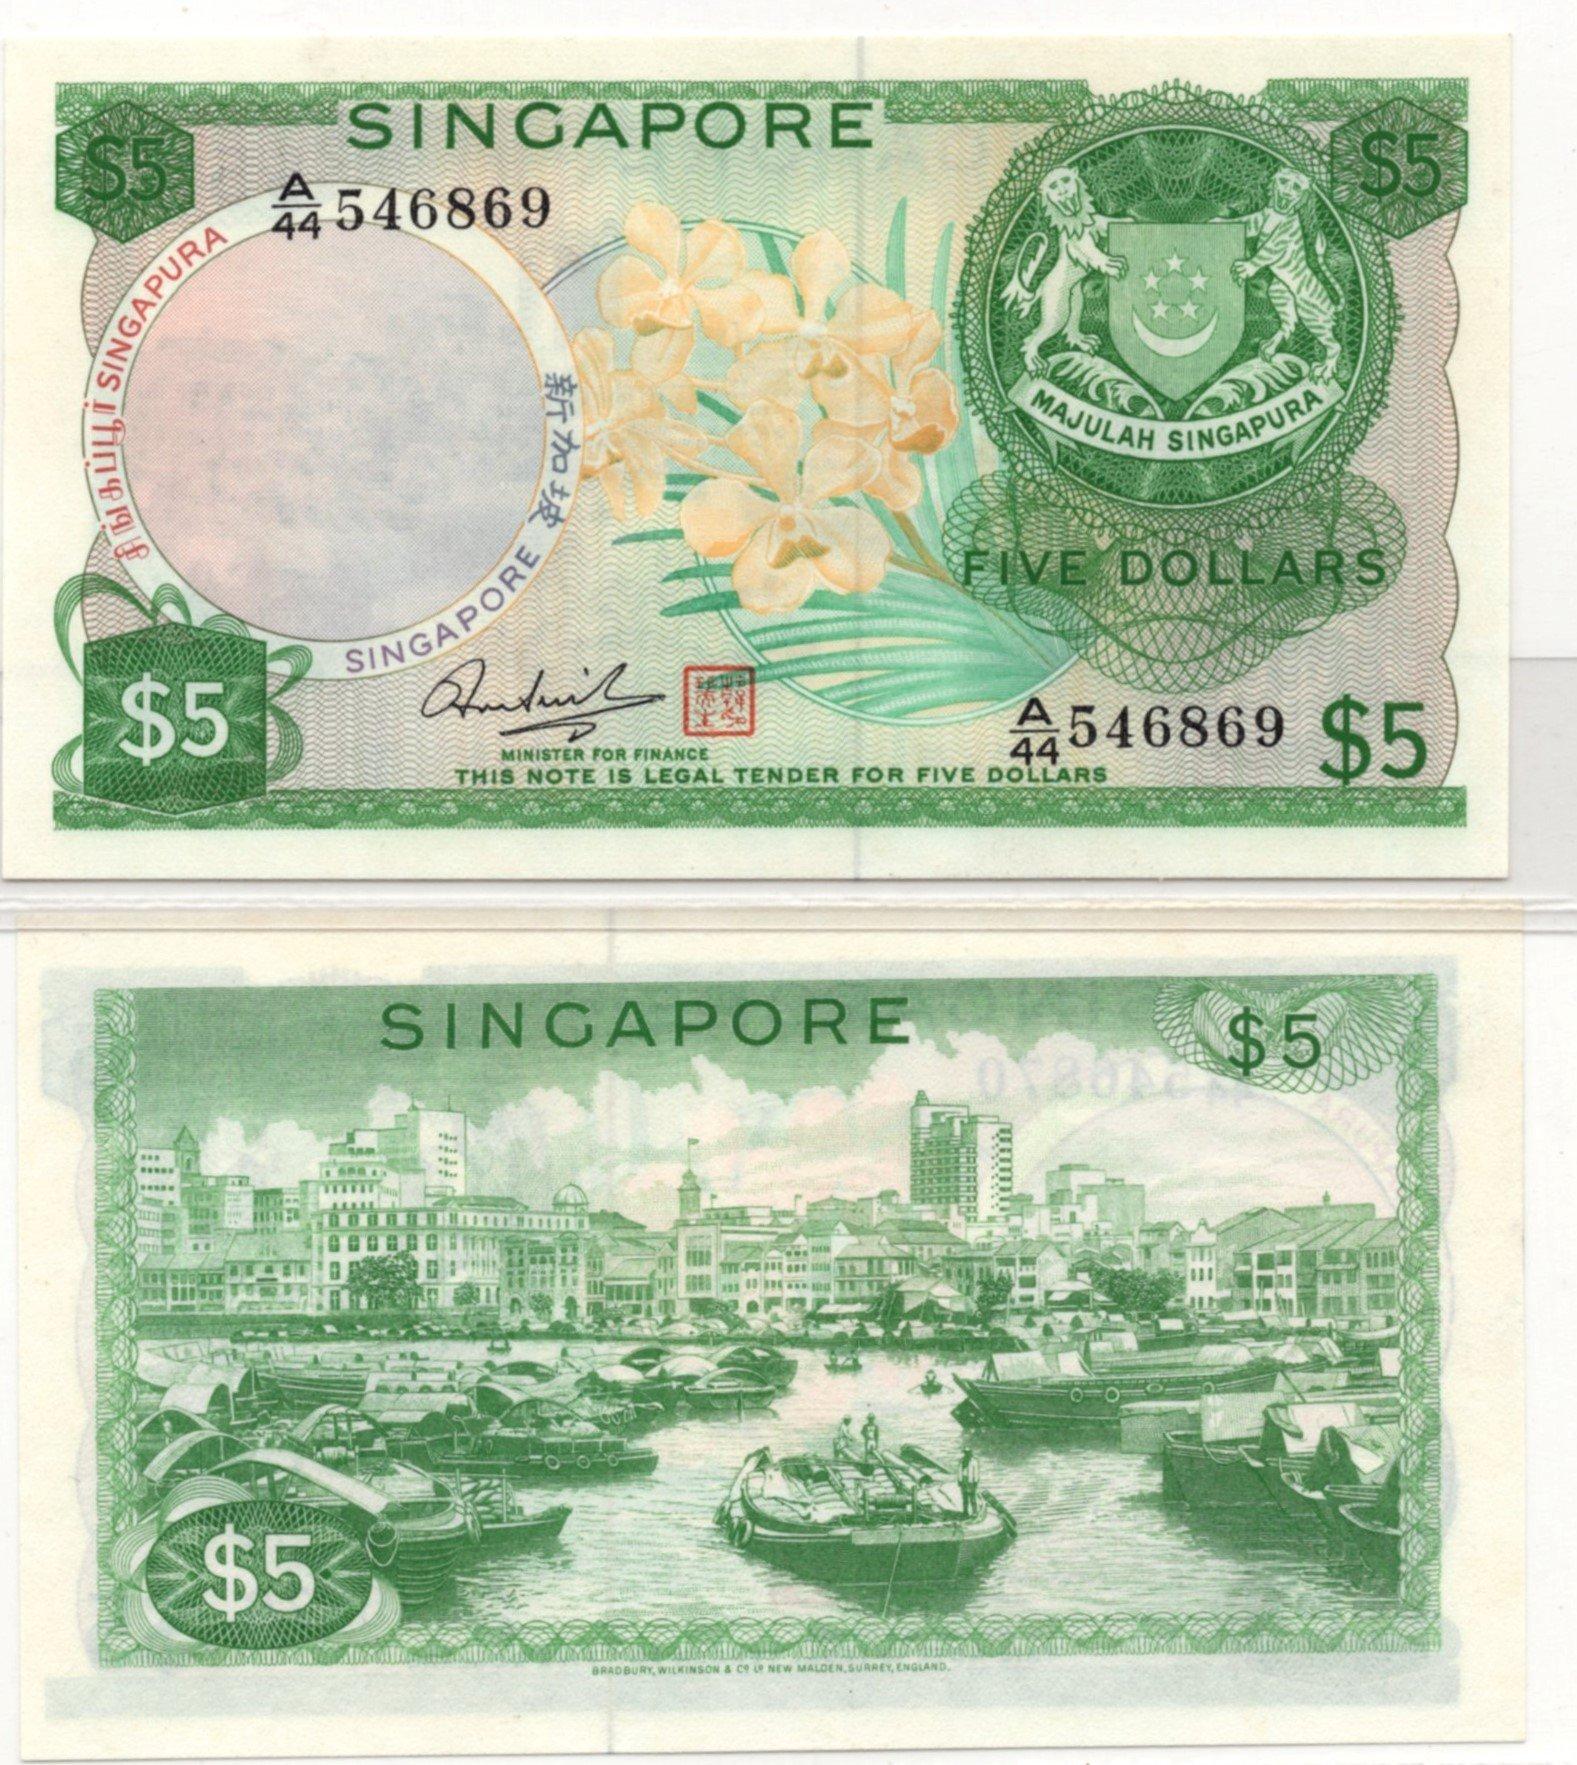 Singapore 5 dollars orchid